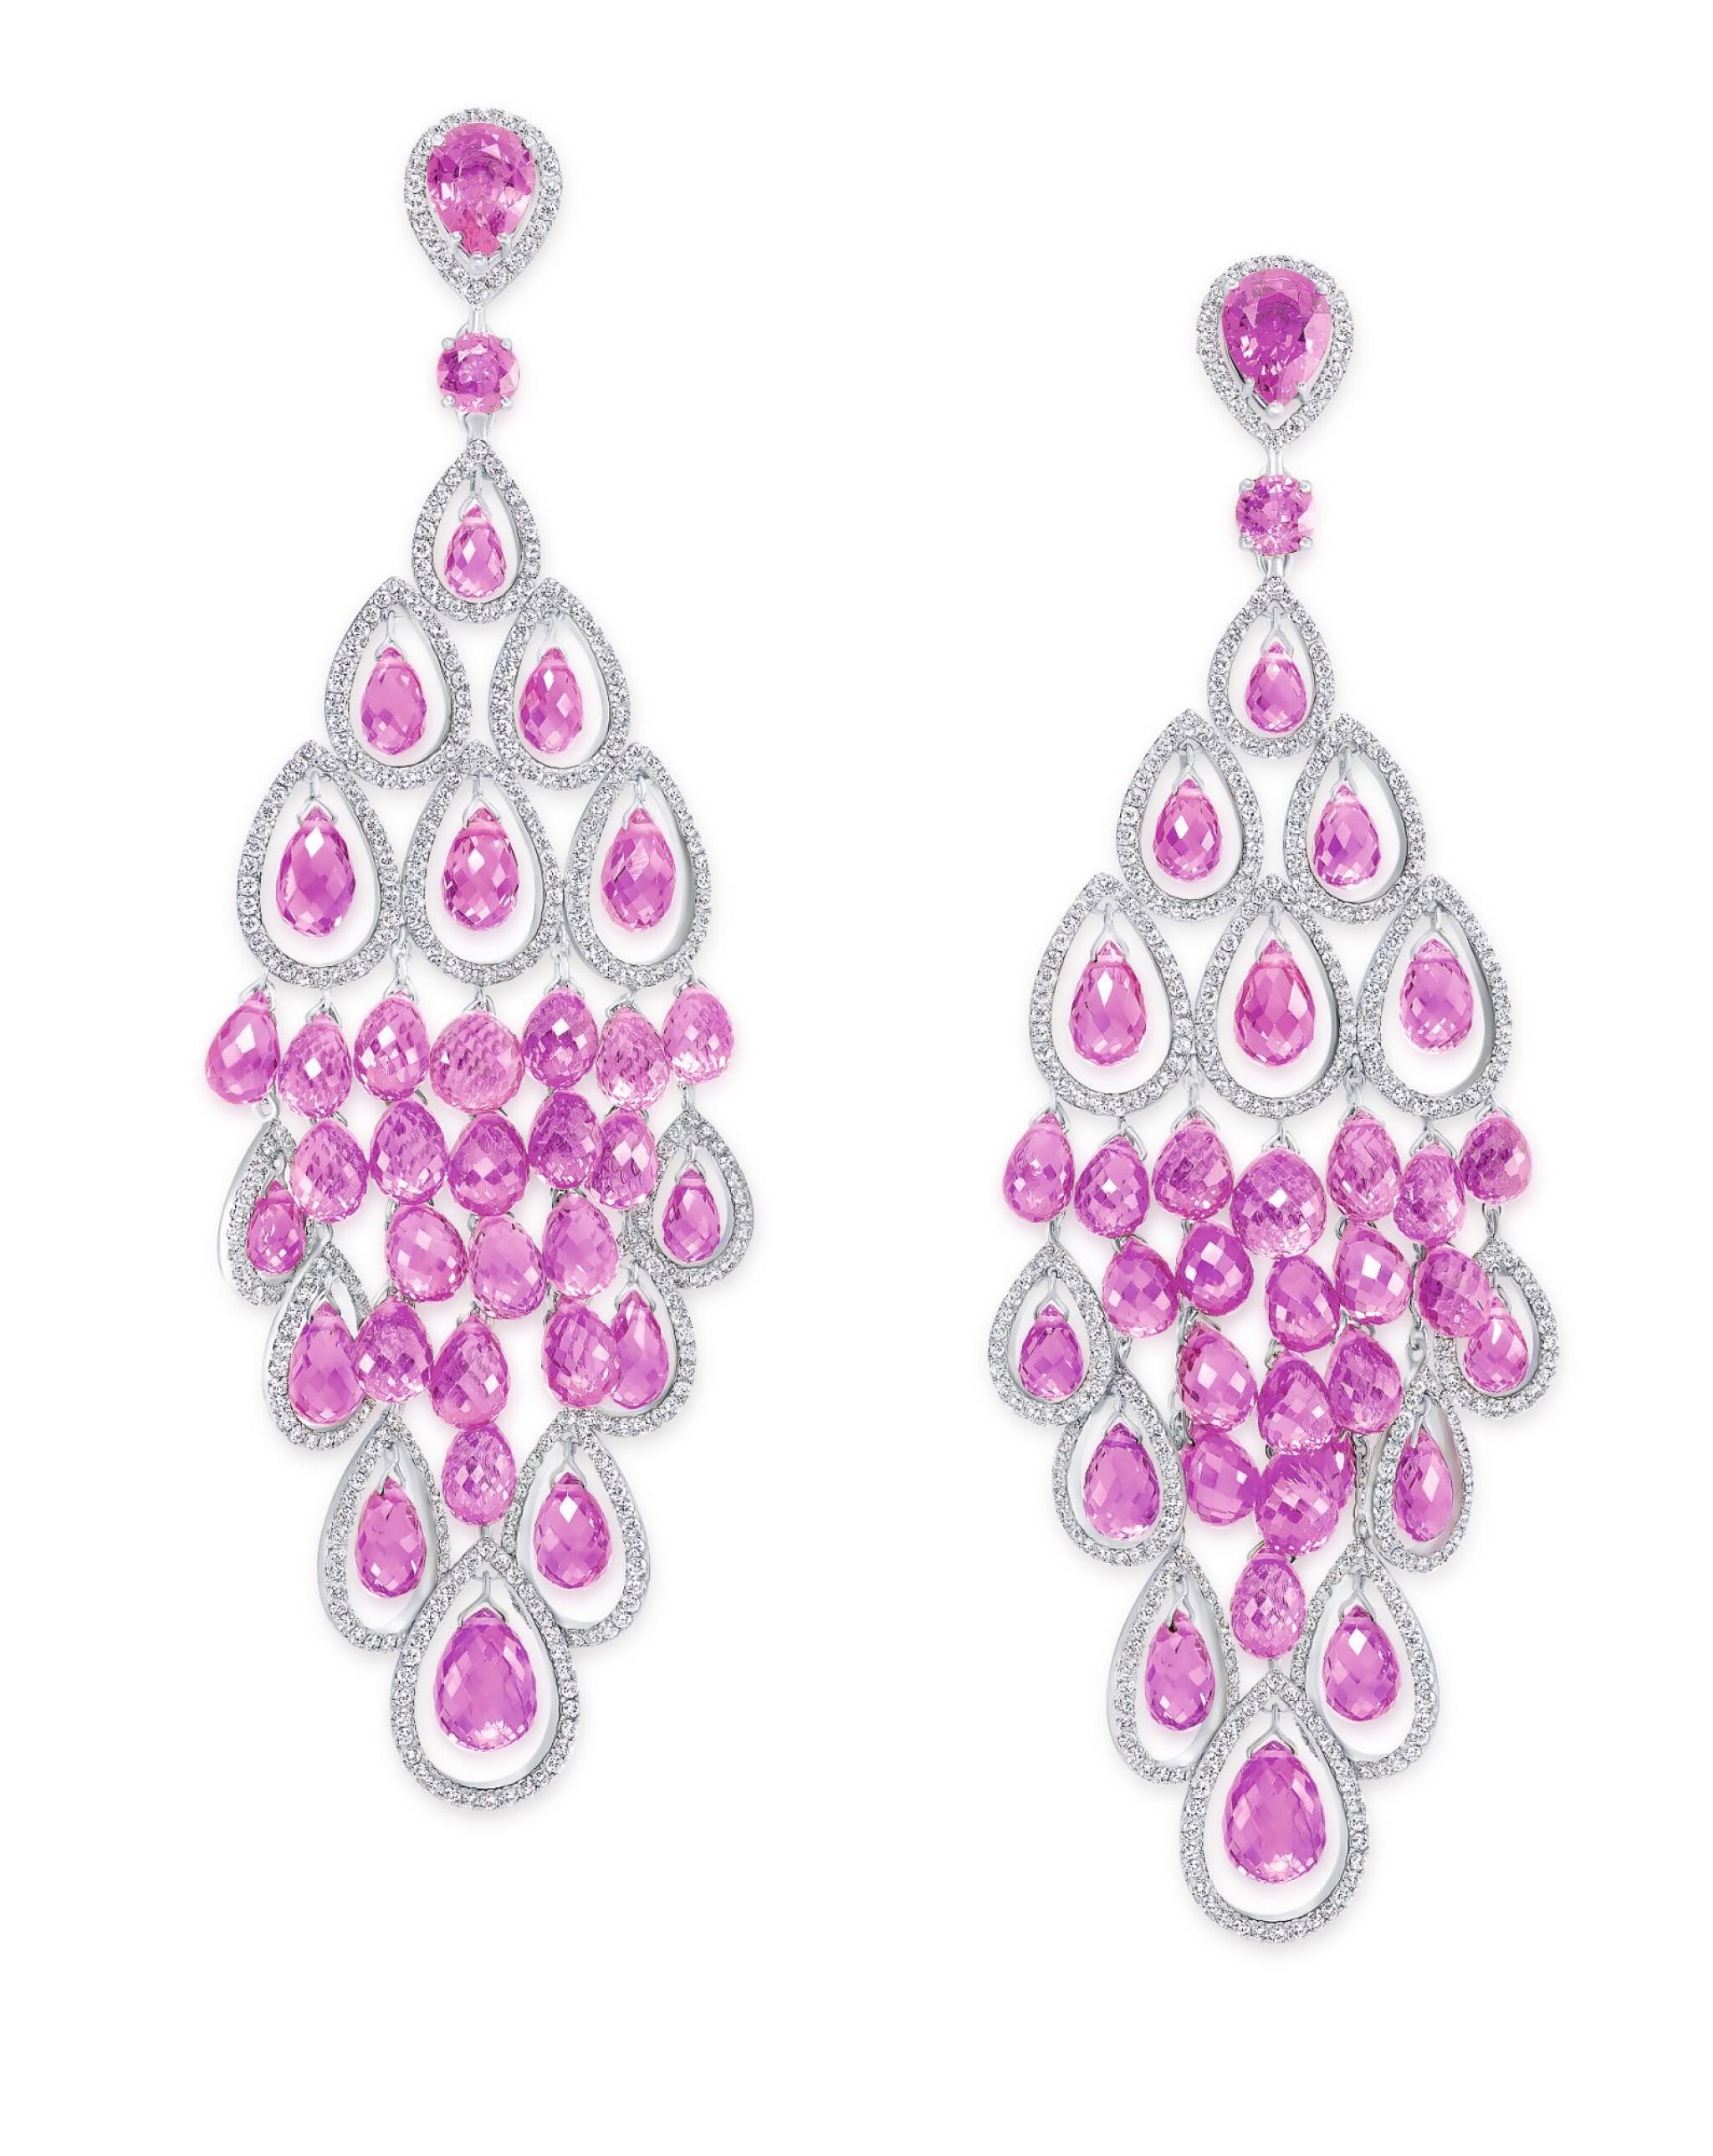 GRAFF | PAIR OF PINK SAPPHIRE AND DIAMOND PENDANT-EARCLIPS 格拉夫 | 粉紅色剛玉配鑽石吊耳環一對